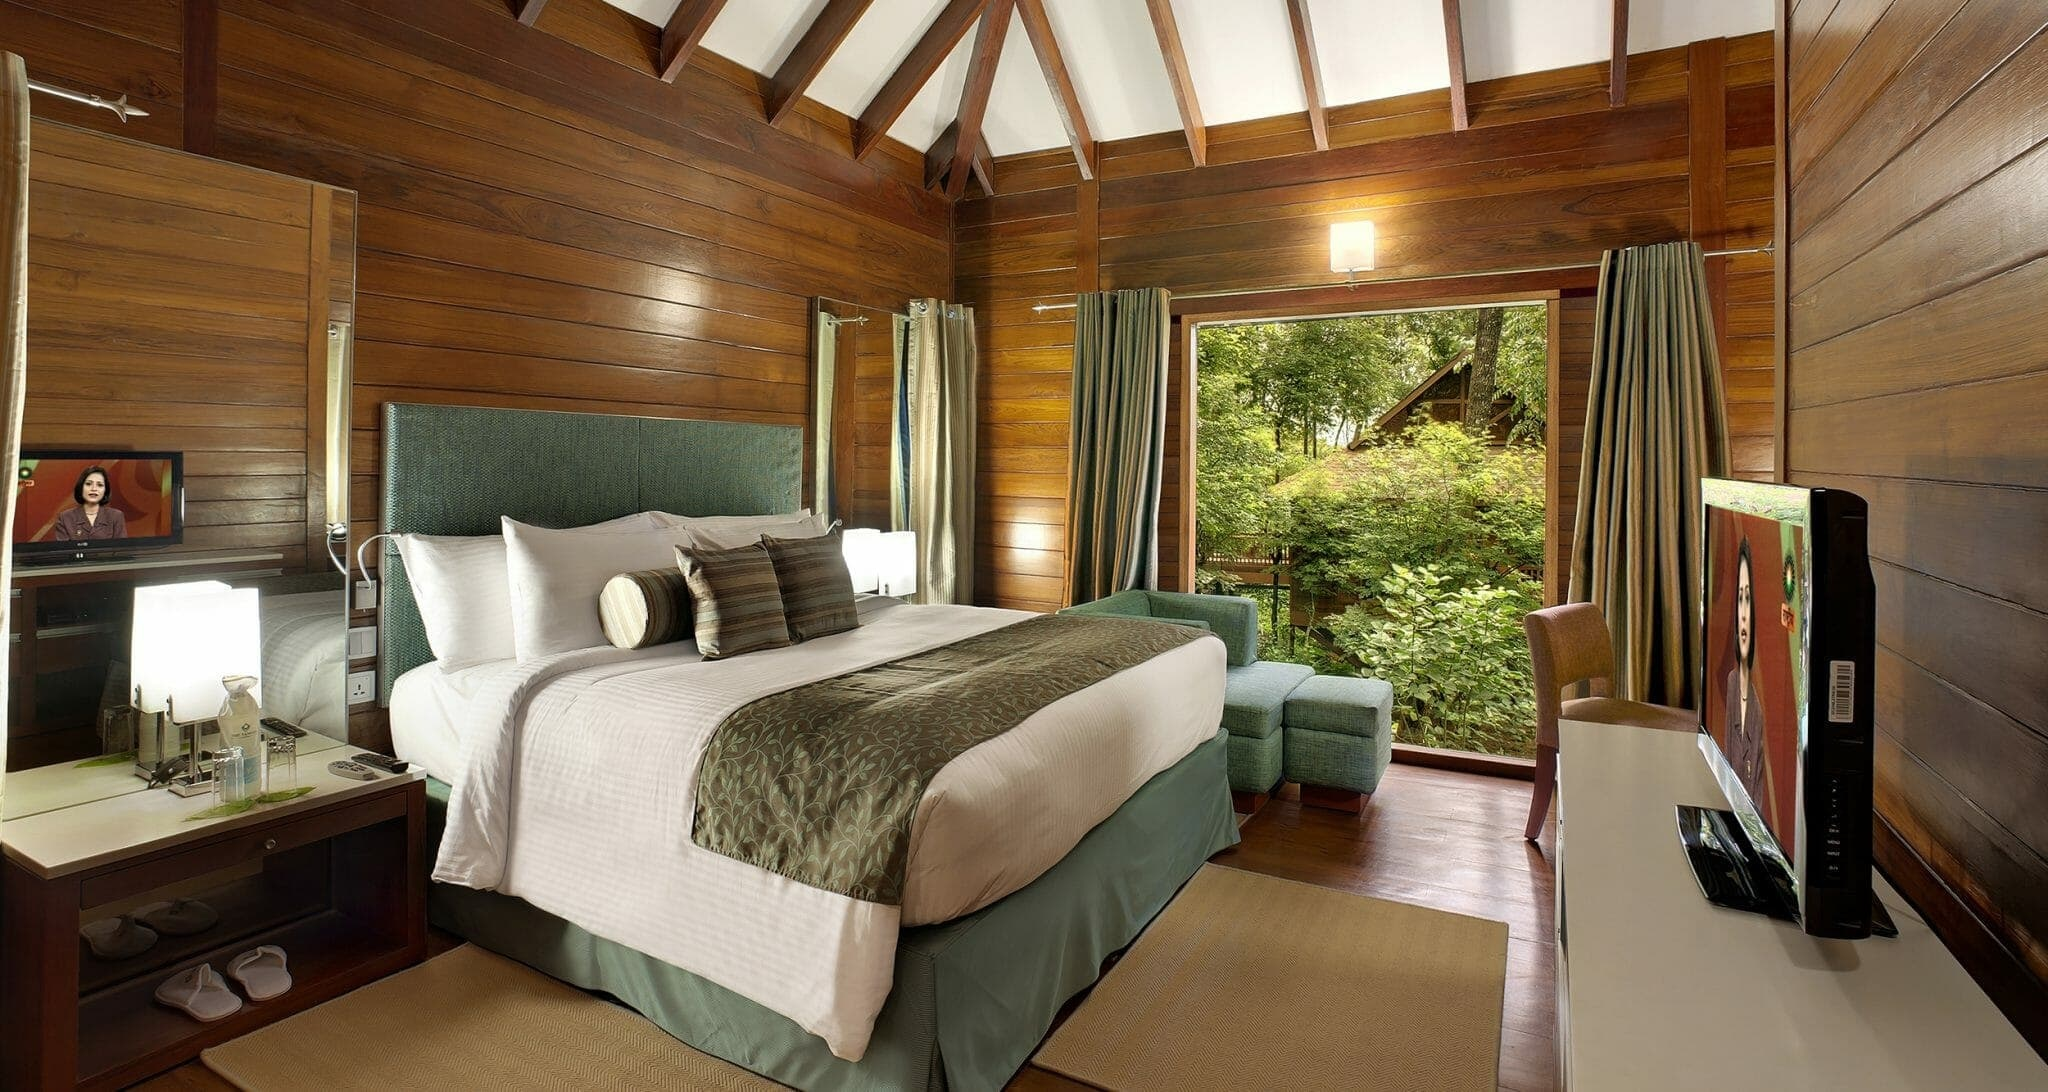 The Tamara Resort Coorg